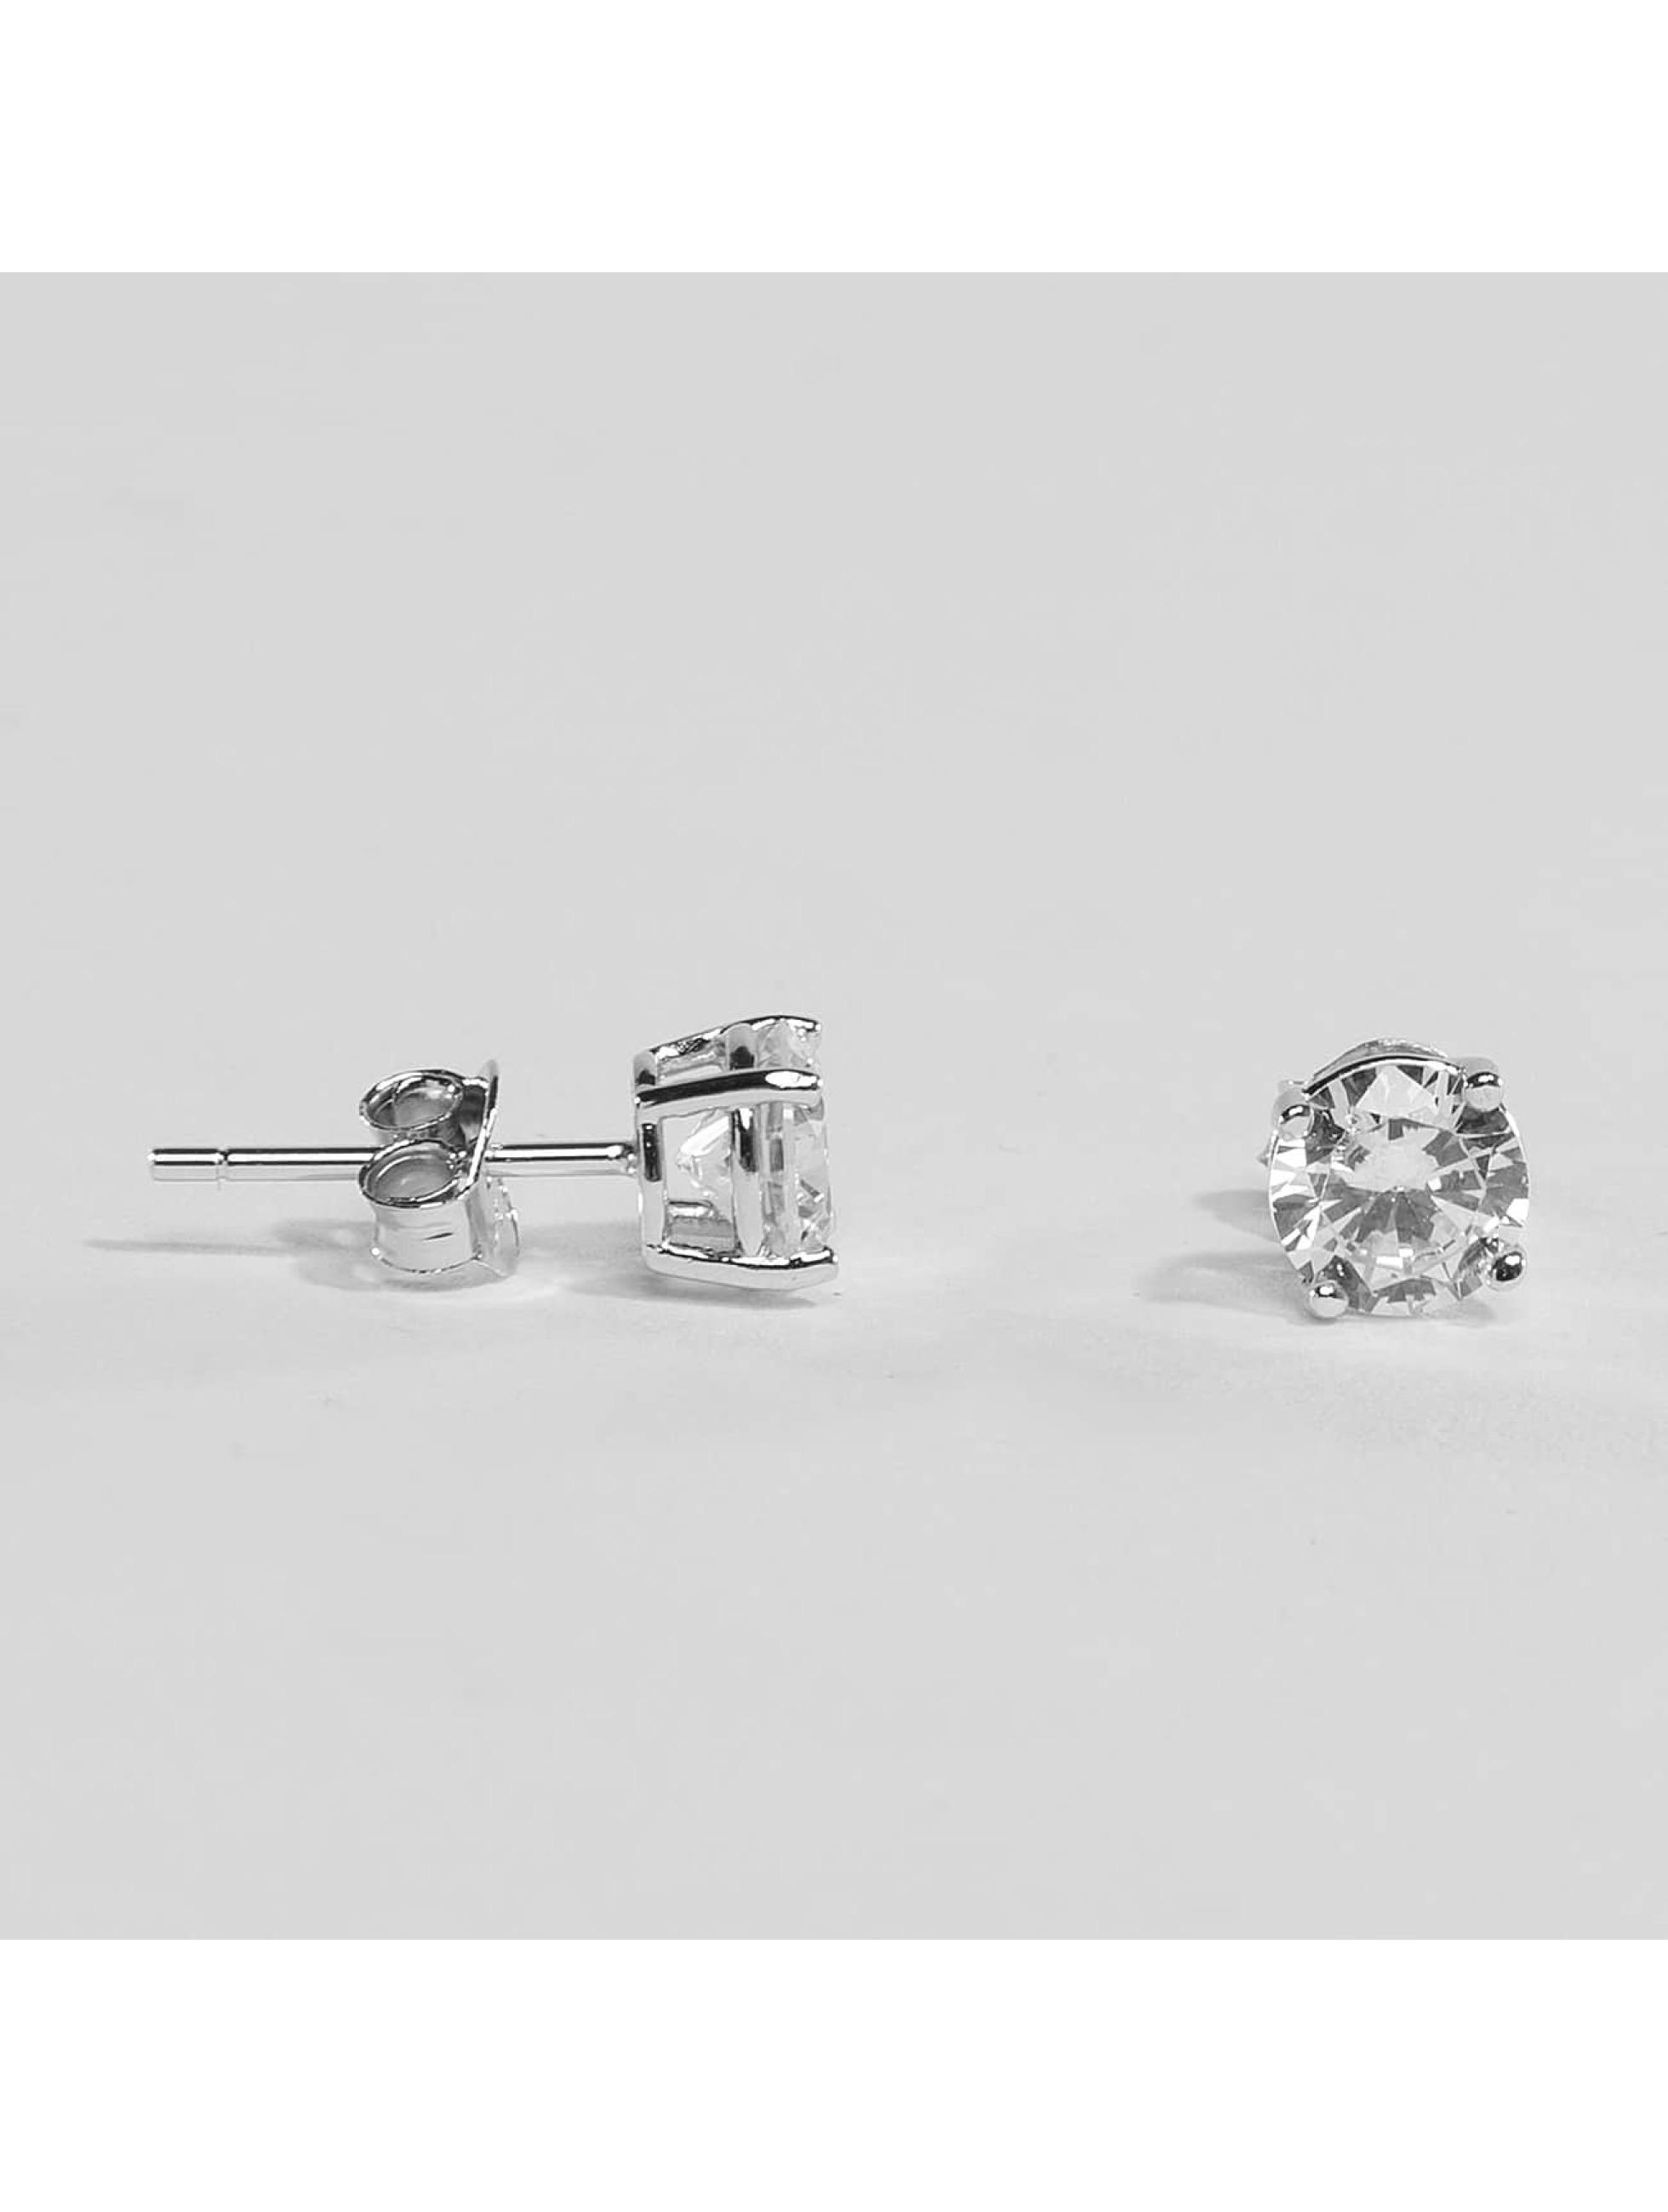 KING ICE Náušnice Rhodium_Plated 6mm 925 Sterling_Silver CZ strieborná